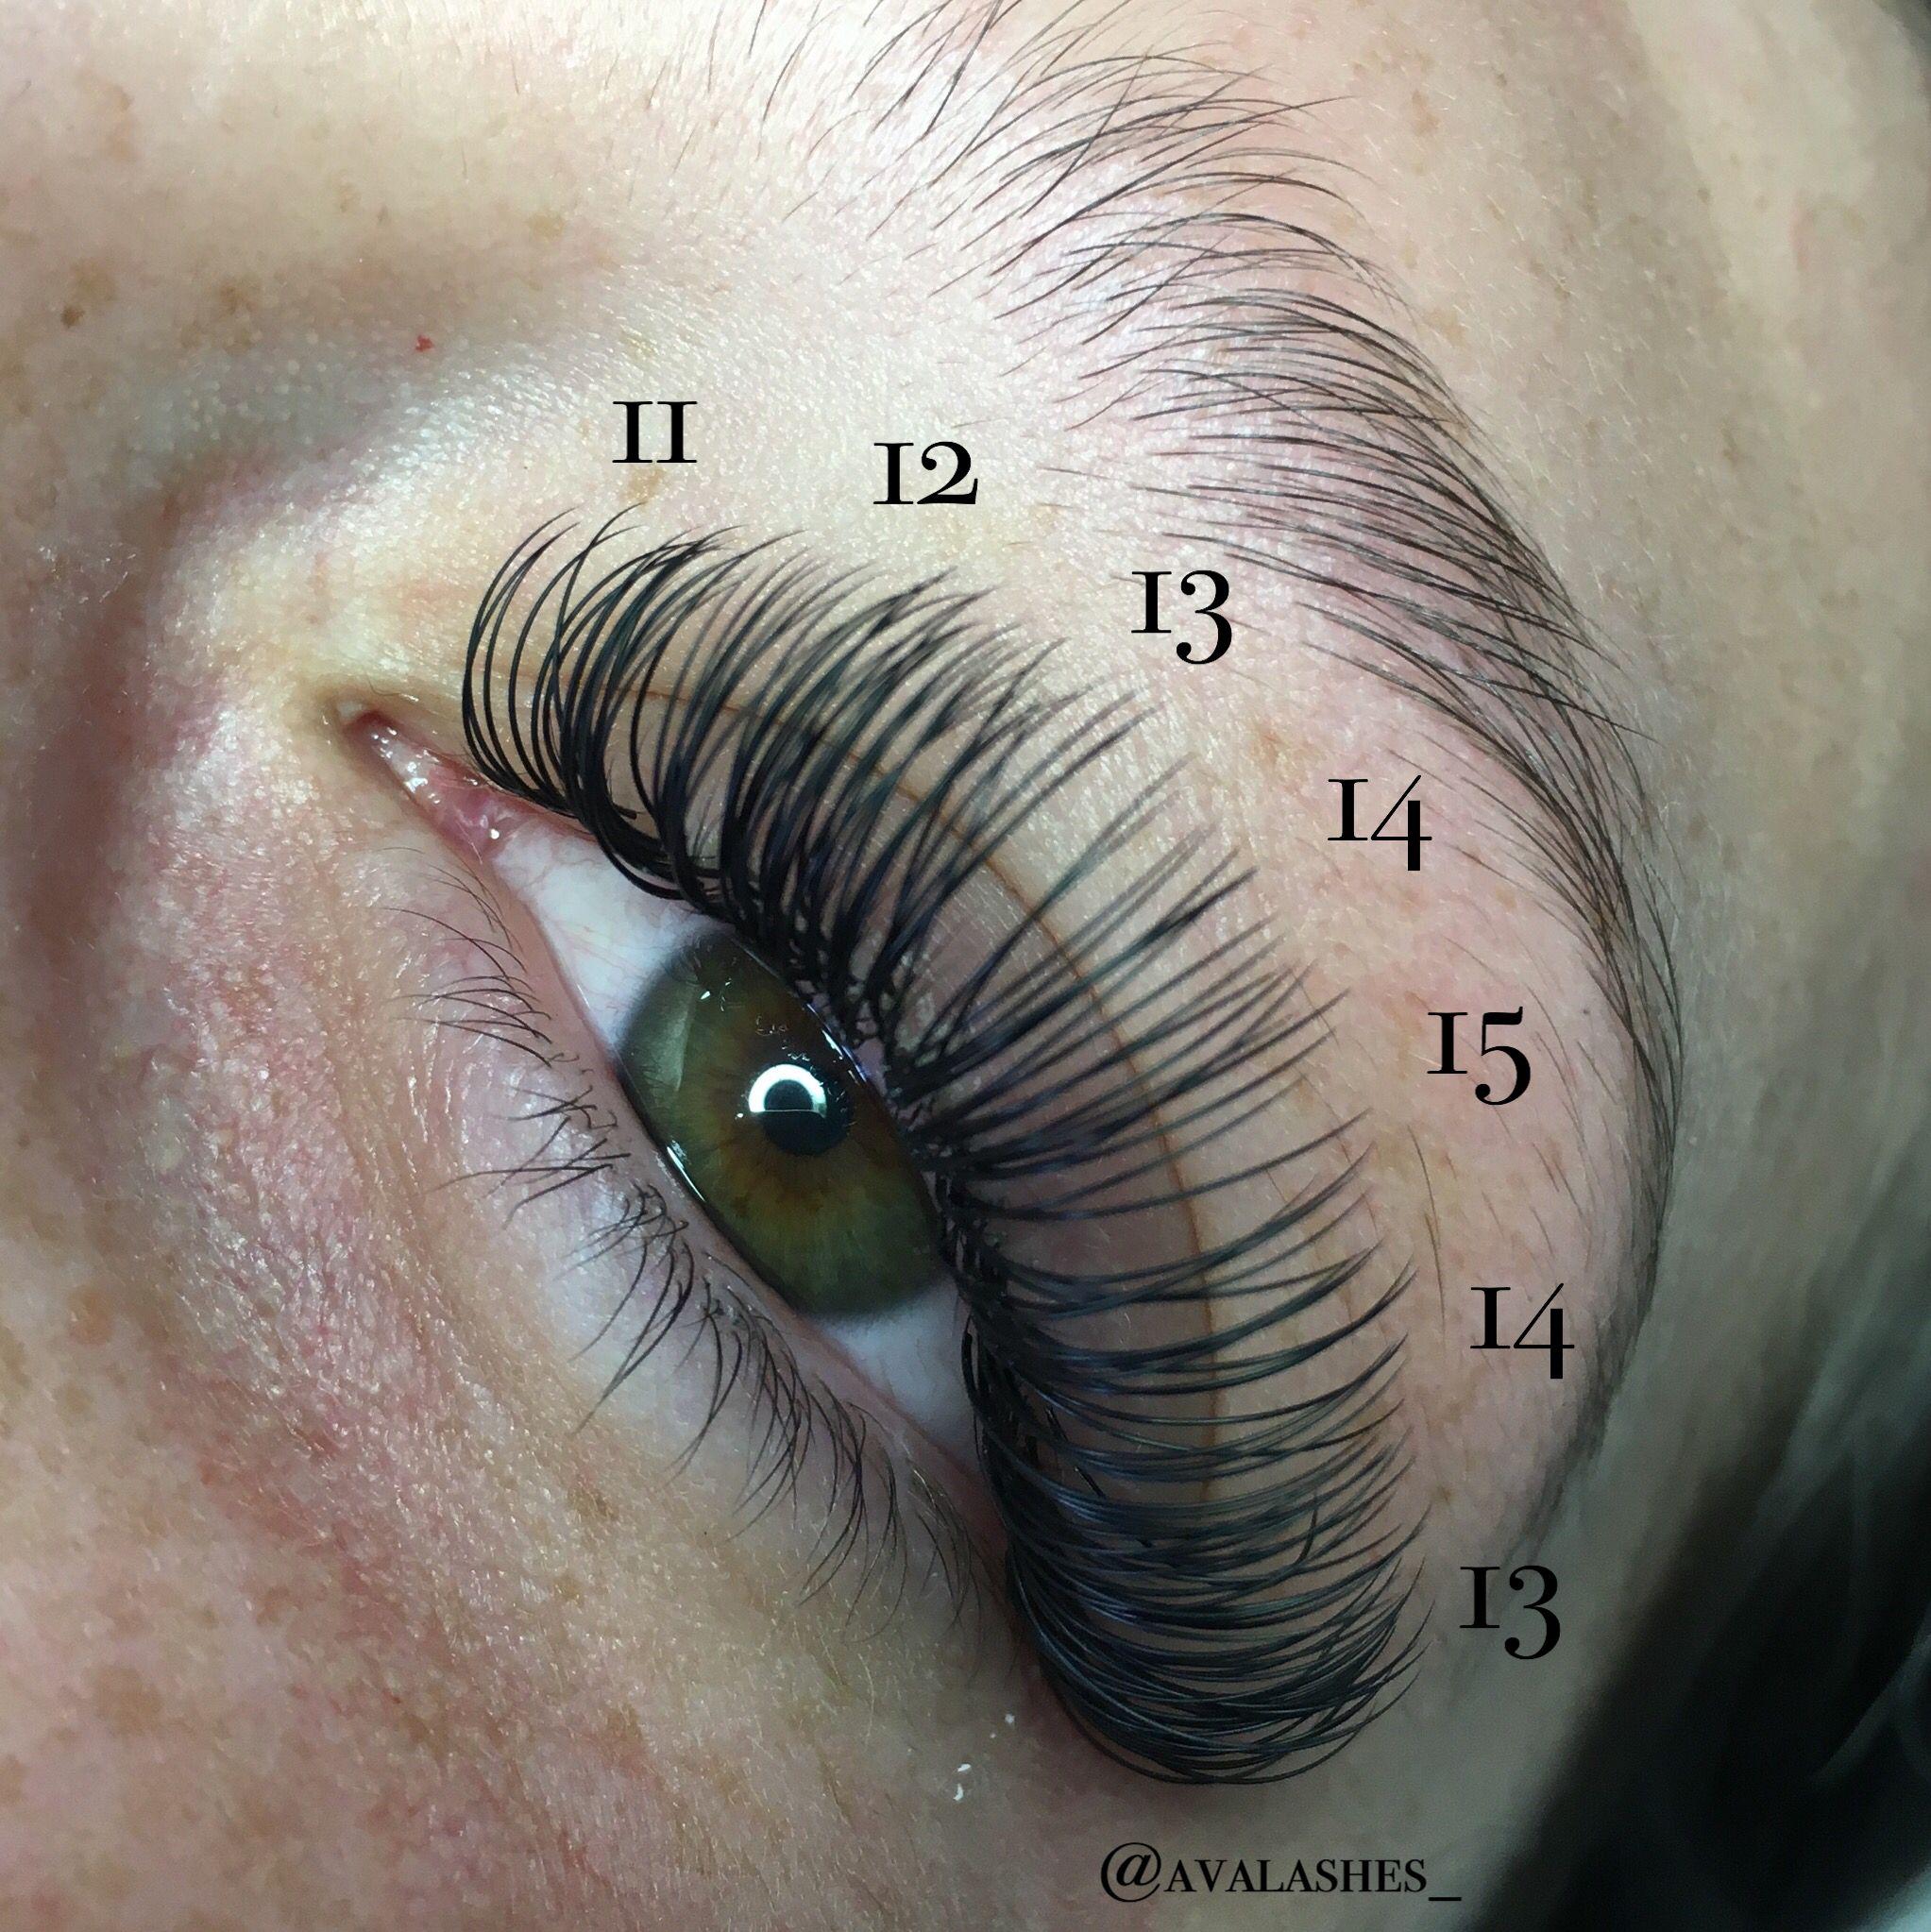 12fc2e7ed8e Ava Lashes Eyelash Extensions Classic Mink DD curl Lash Mapping Semi  Permanent Eyelash Extensions